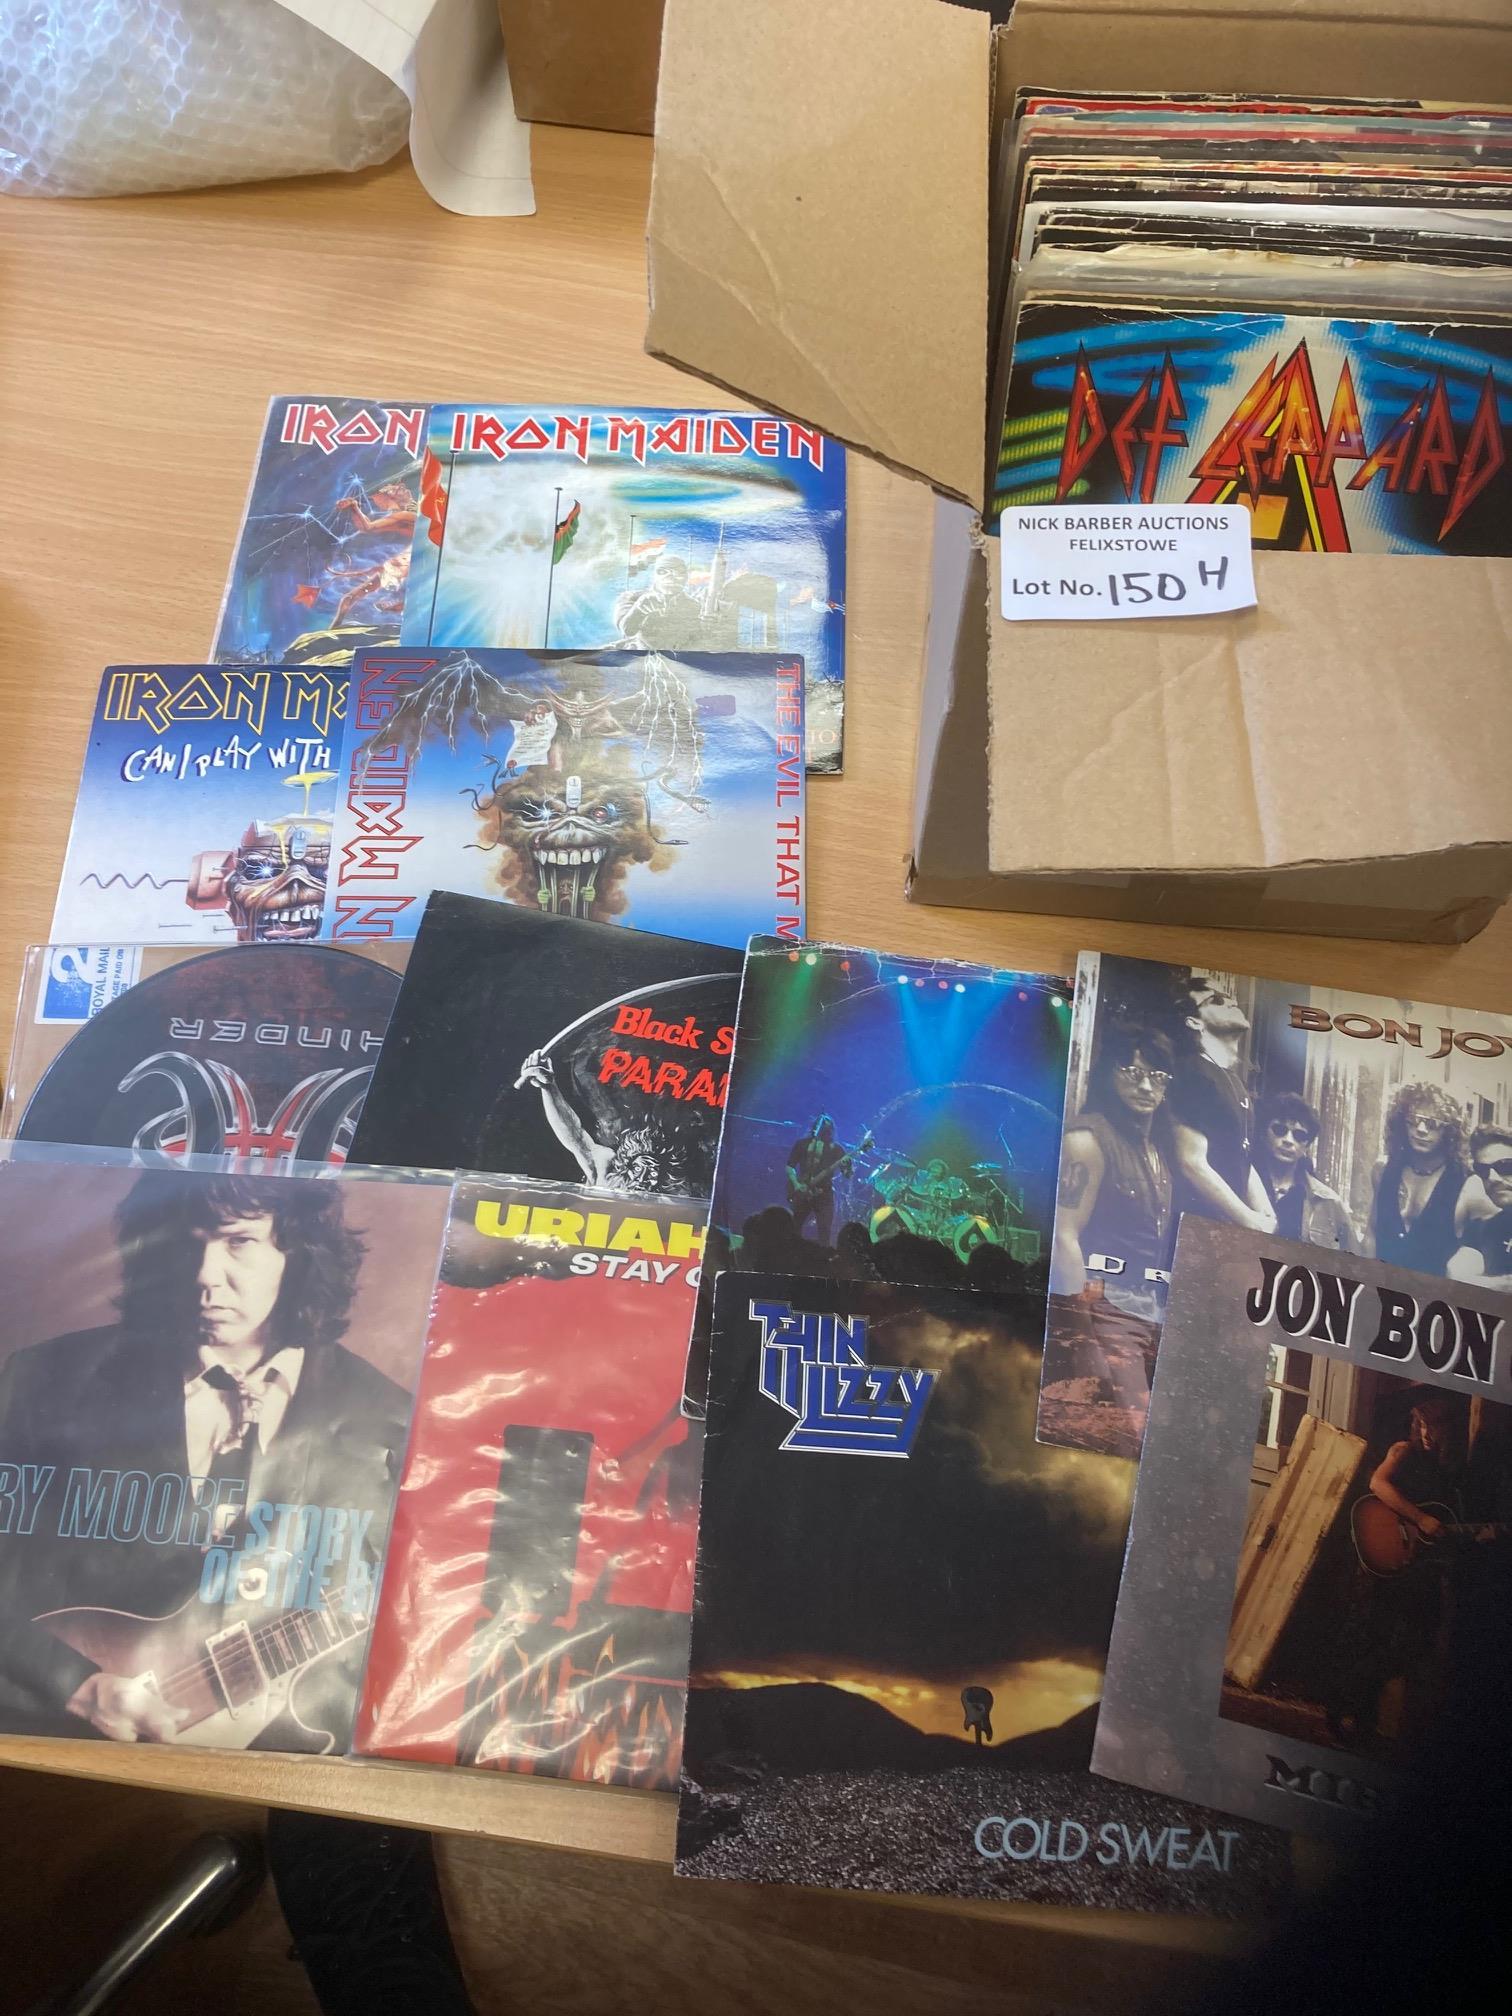 Records : 50 Heavy Metal/Rock 45's inc Iron Maide